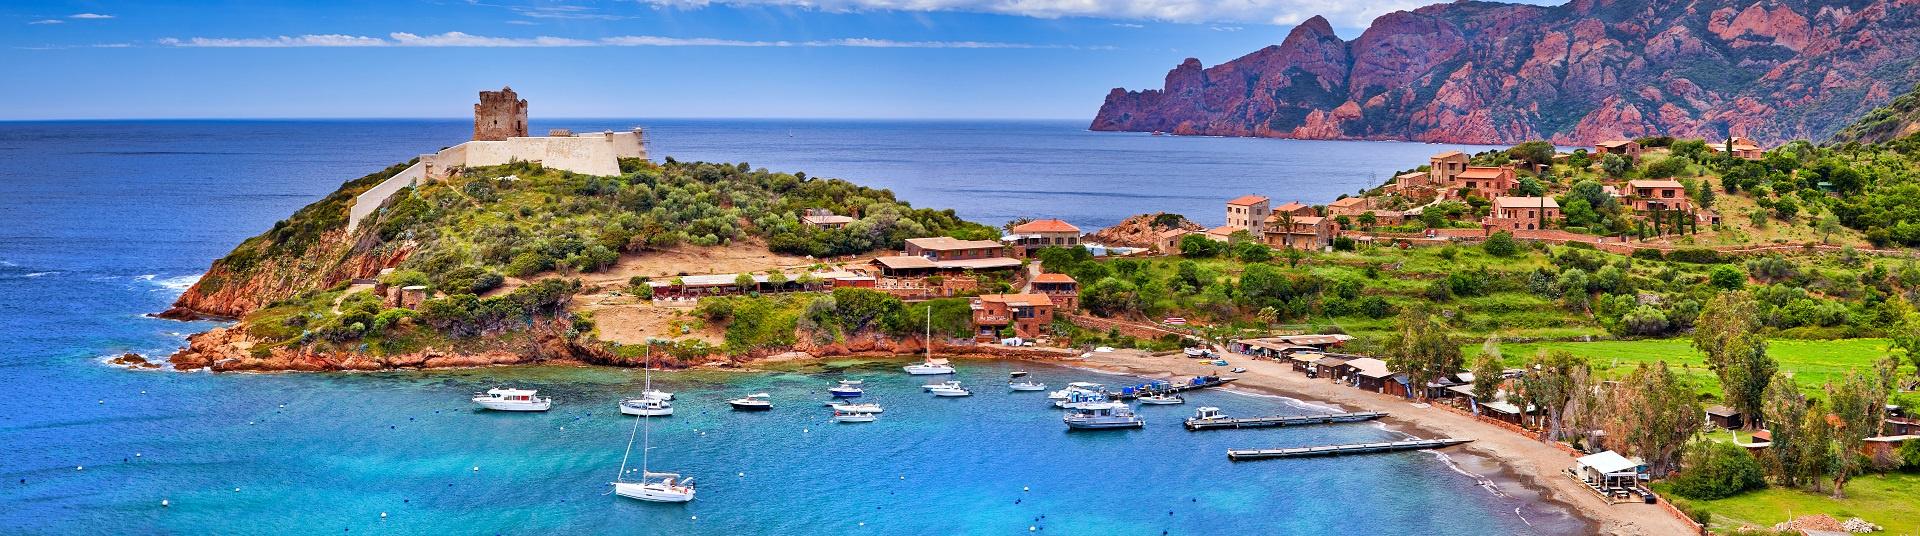 Week-end pas cher Corse